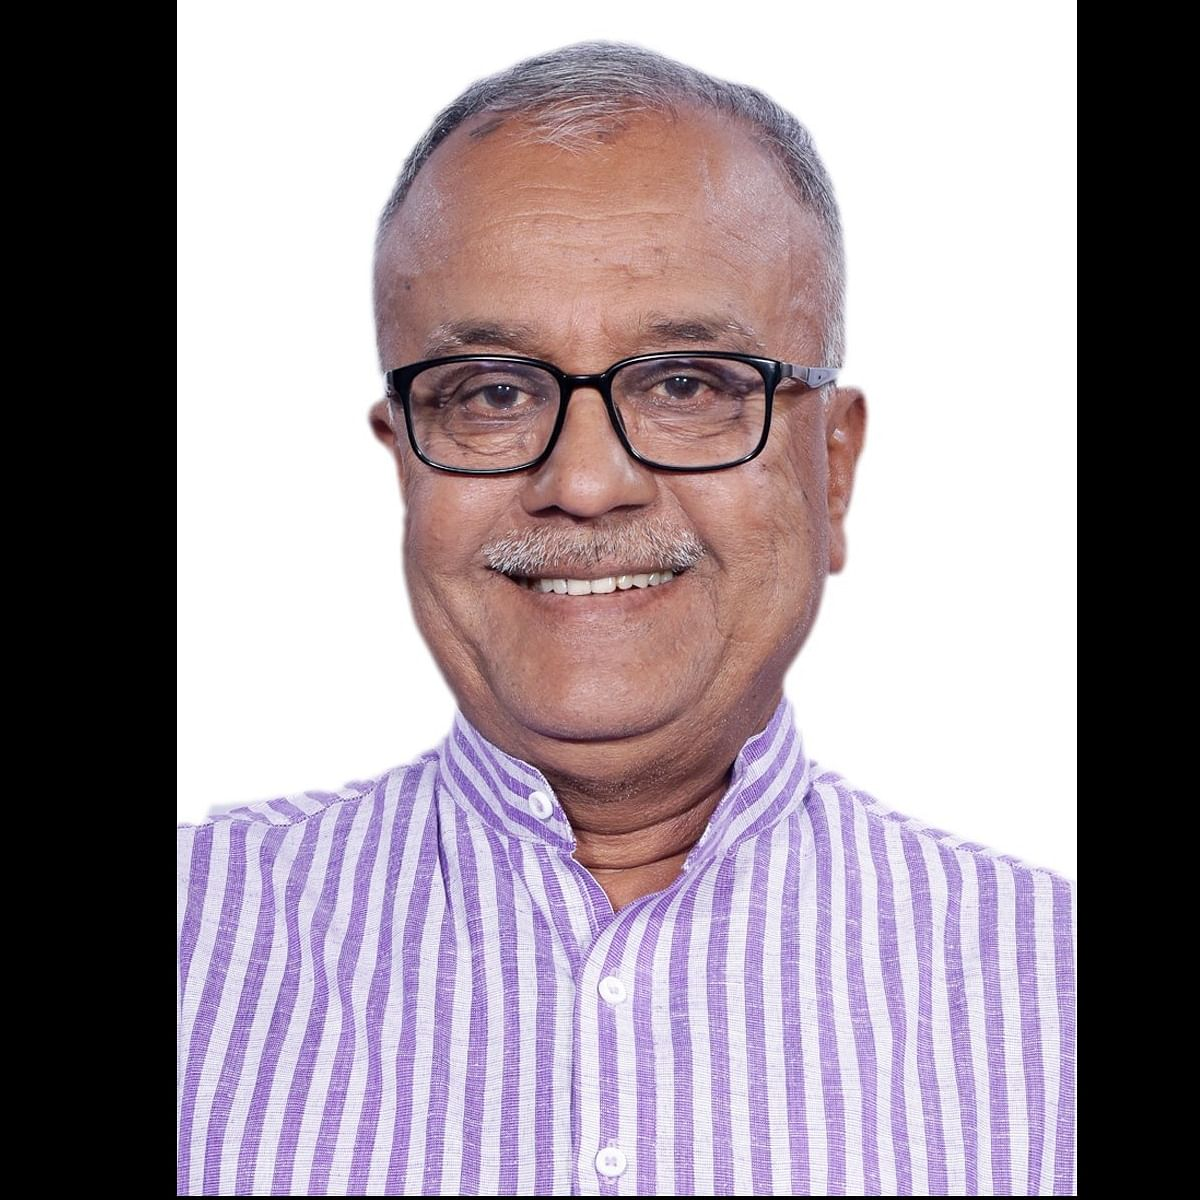 BJP's Khandwa MP Nand Kumar Singh Chauhan passes away